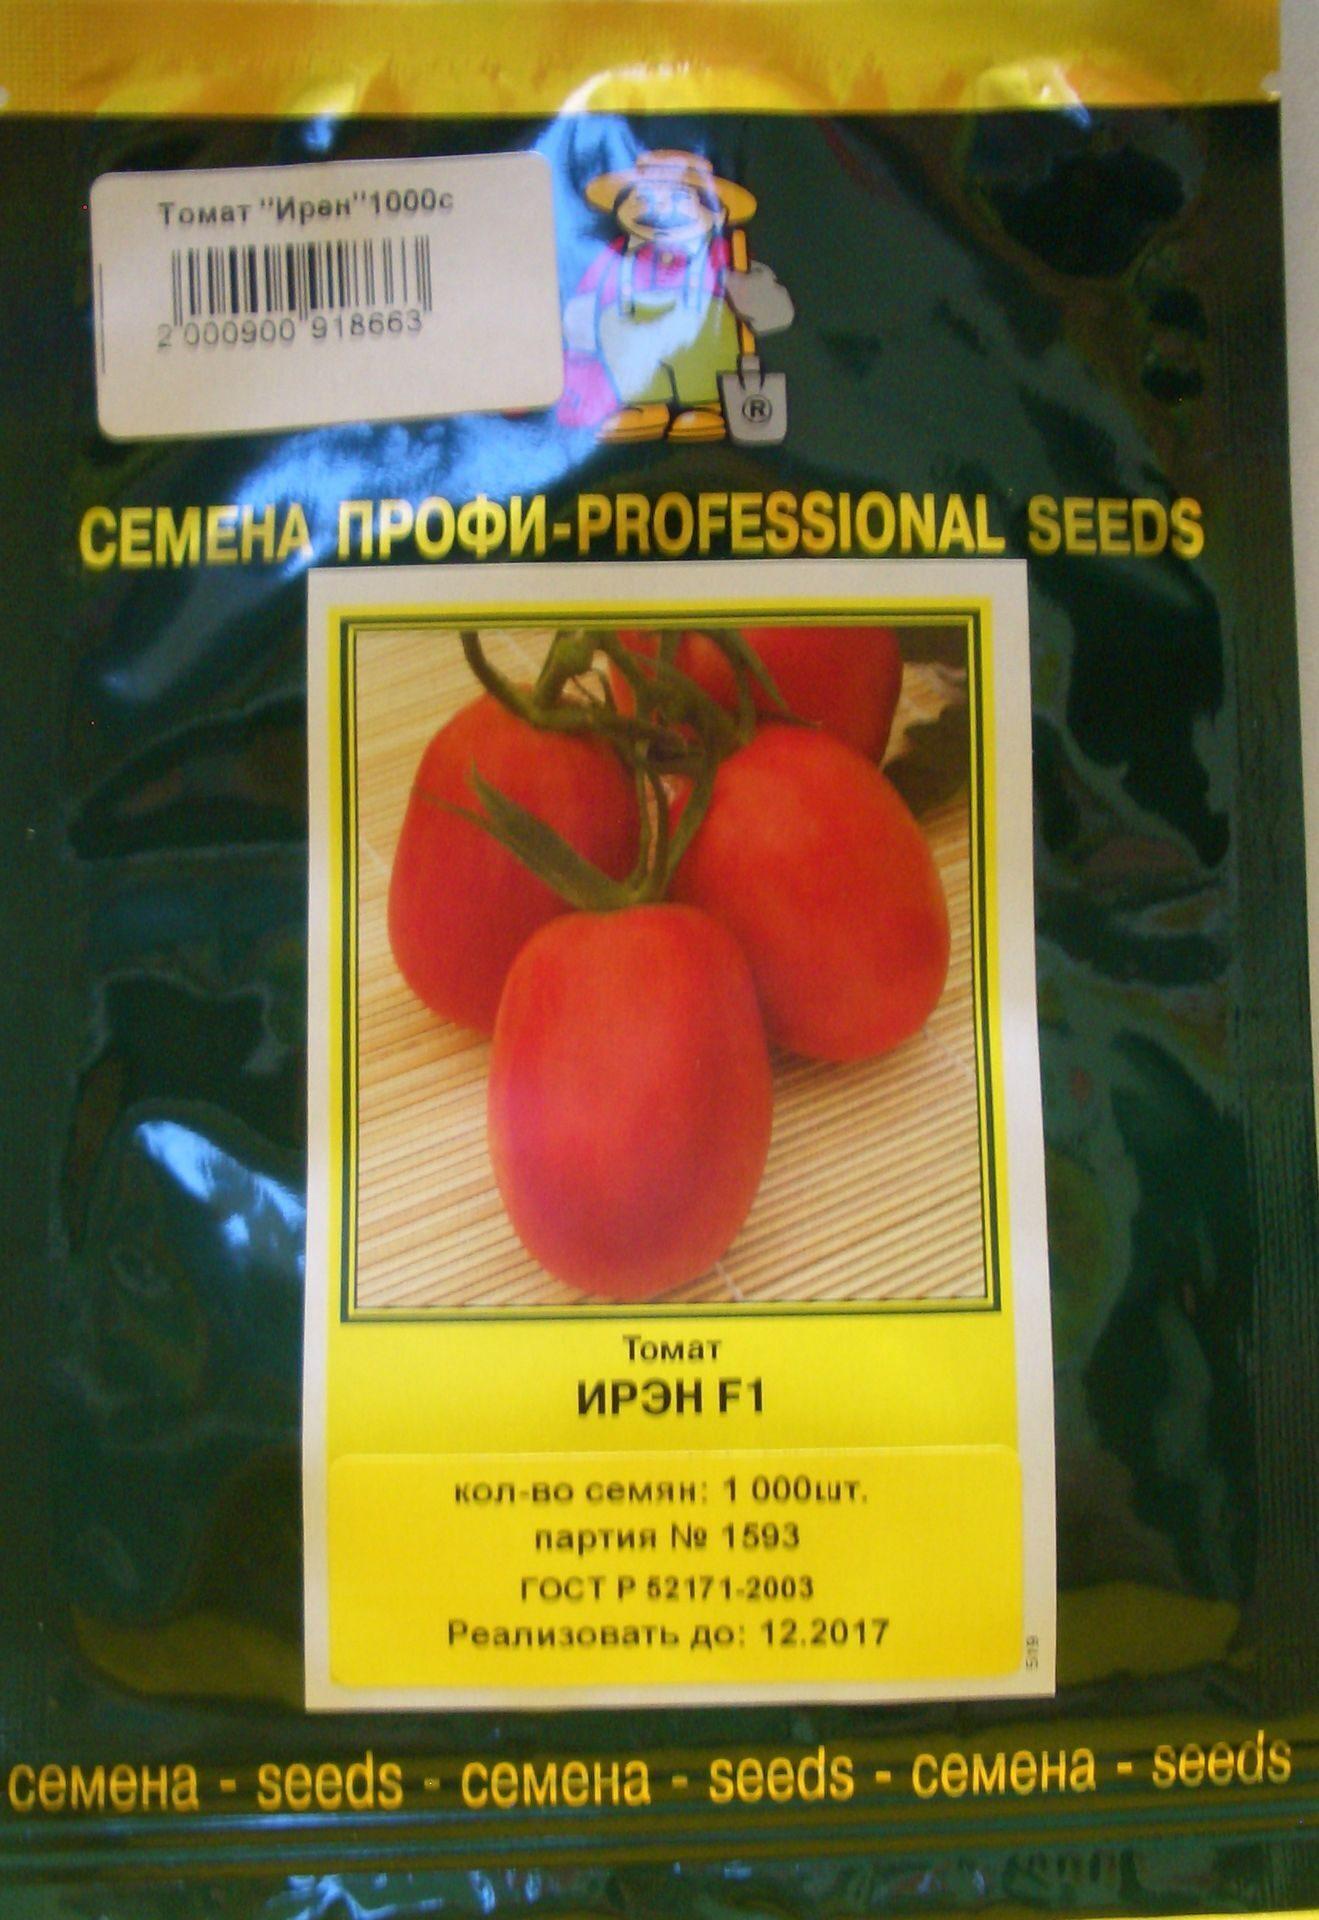 АГРОФИРМА ПОИСК - семена оптом